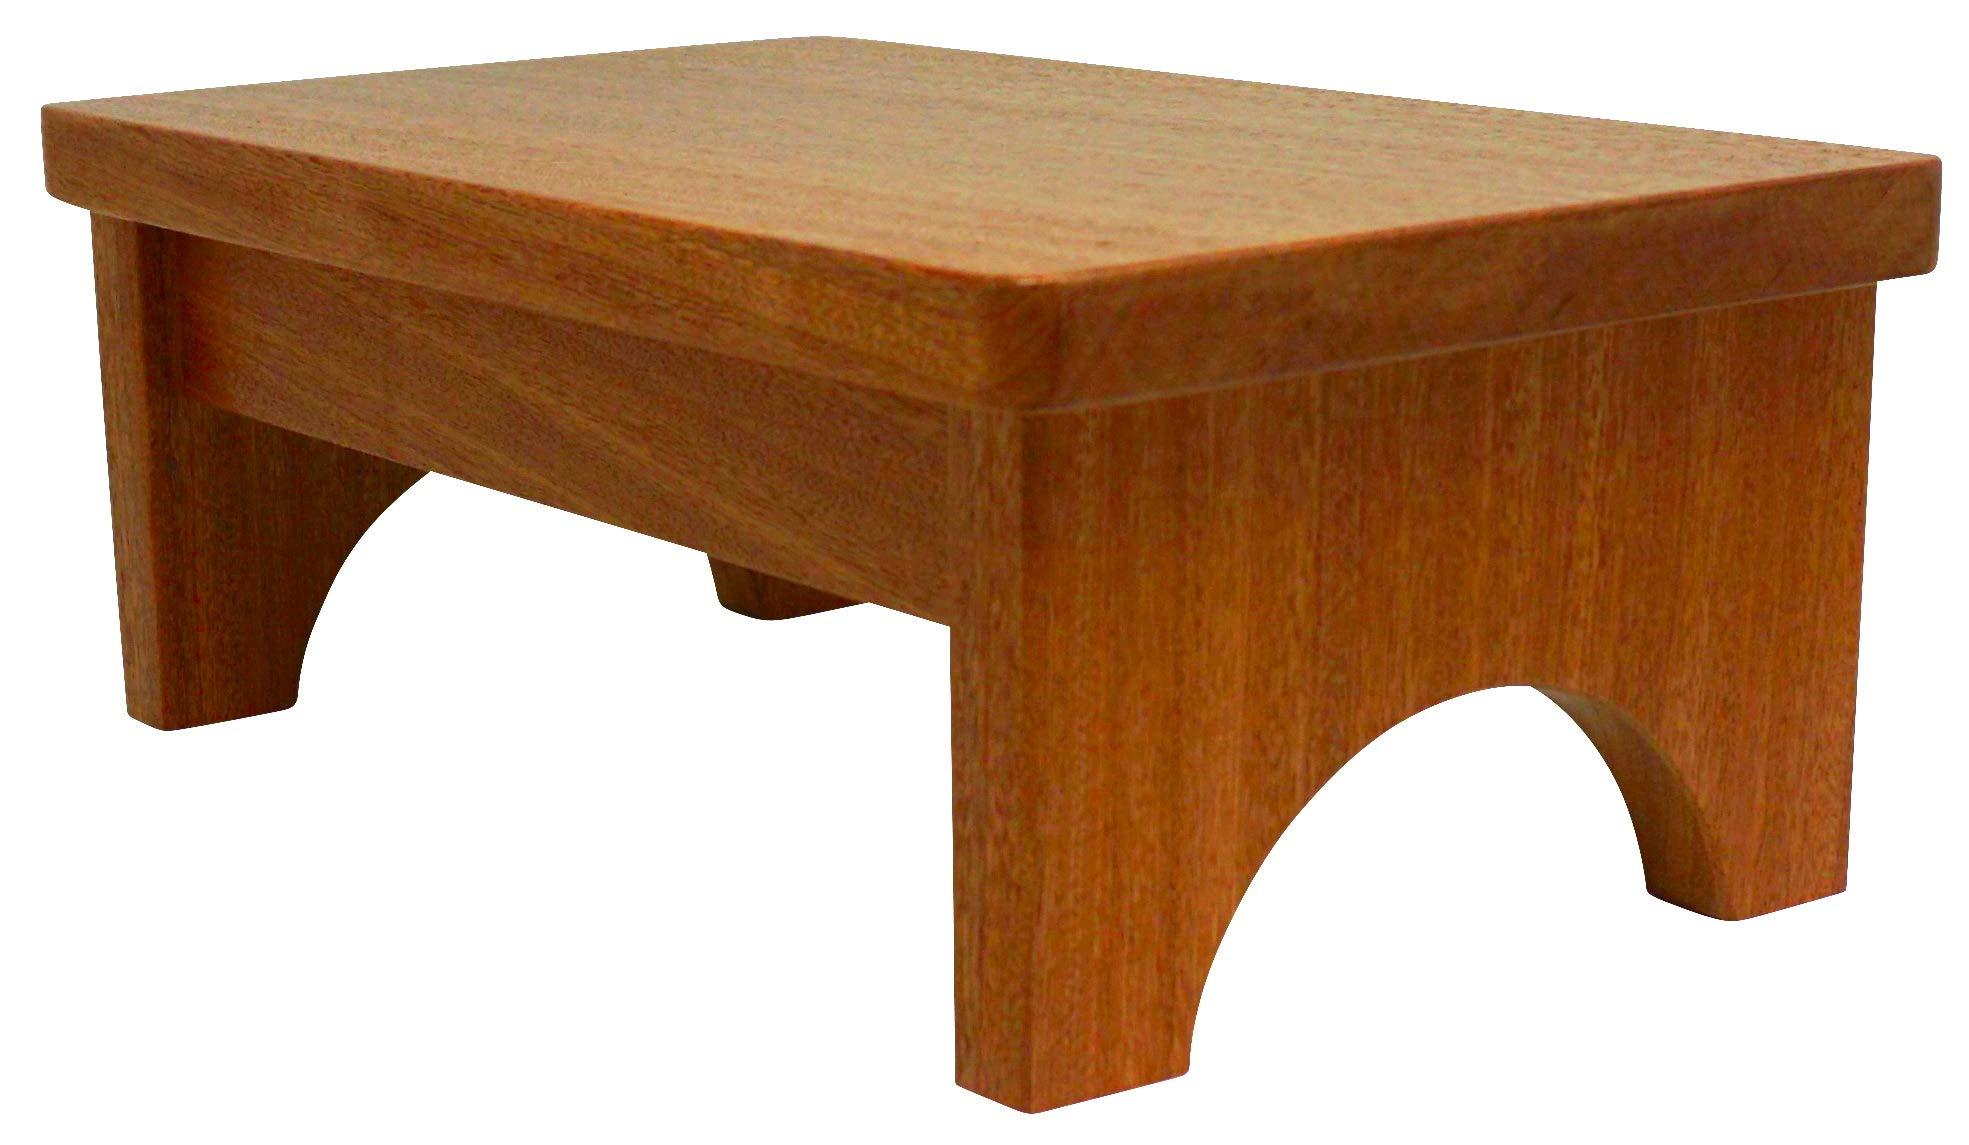 HollandCraft - 5'' Wooden Foot Stool - Hidden Wood Dowels (No Screws, Staples or Nails)